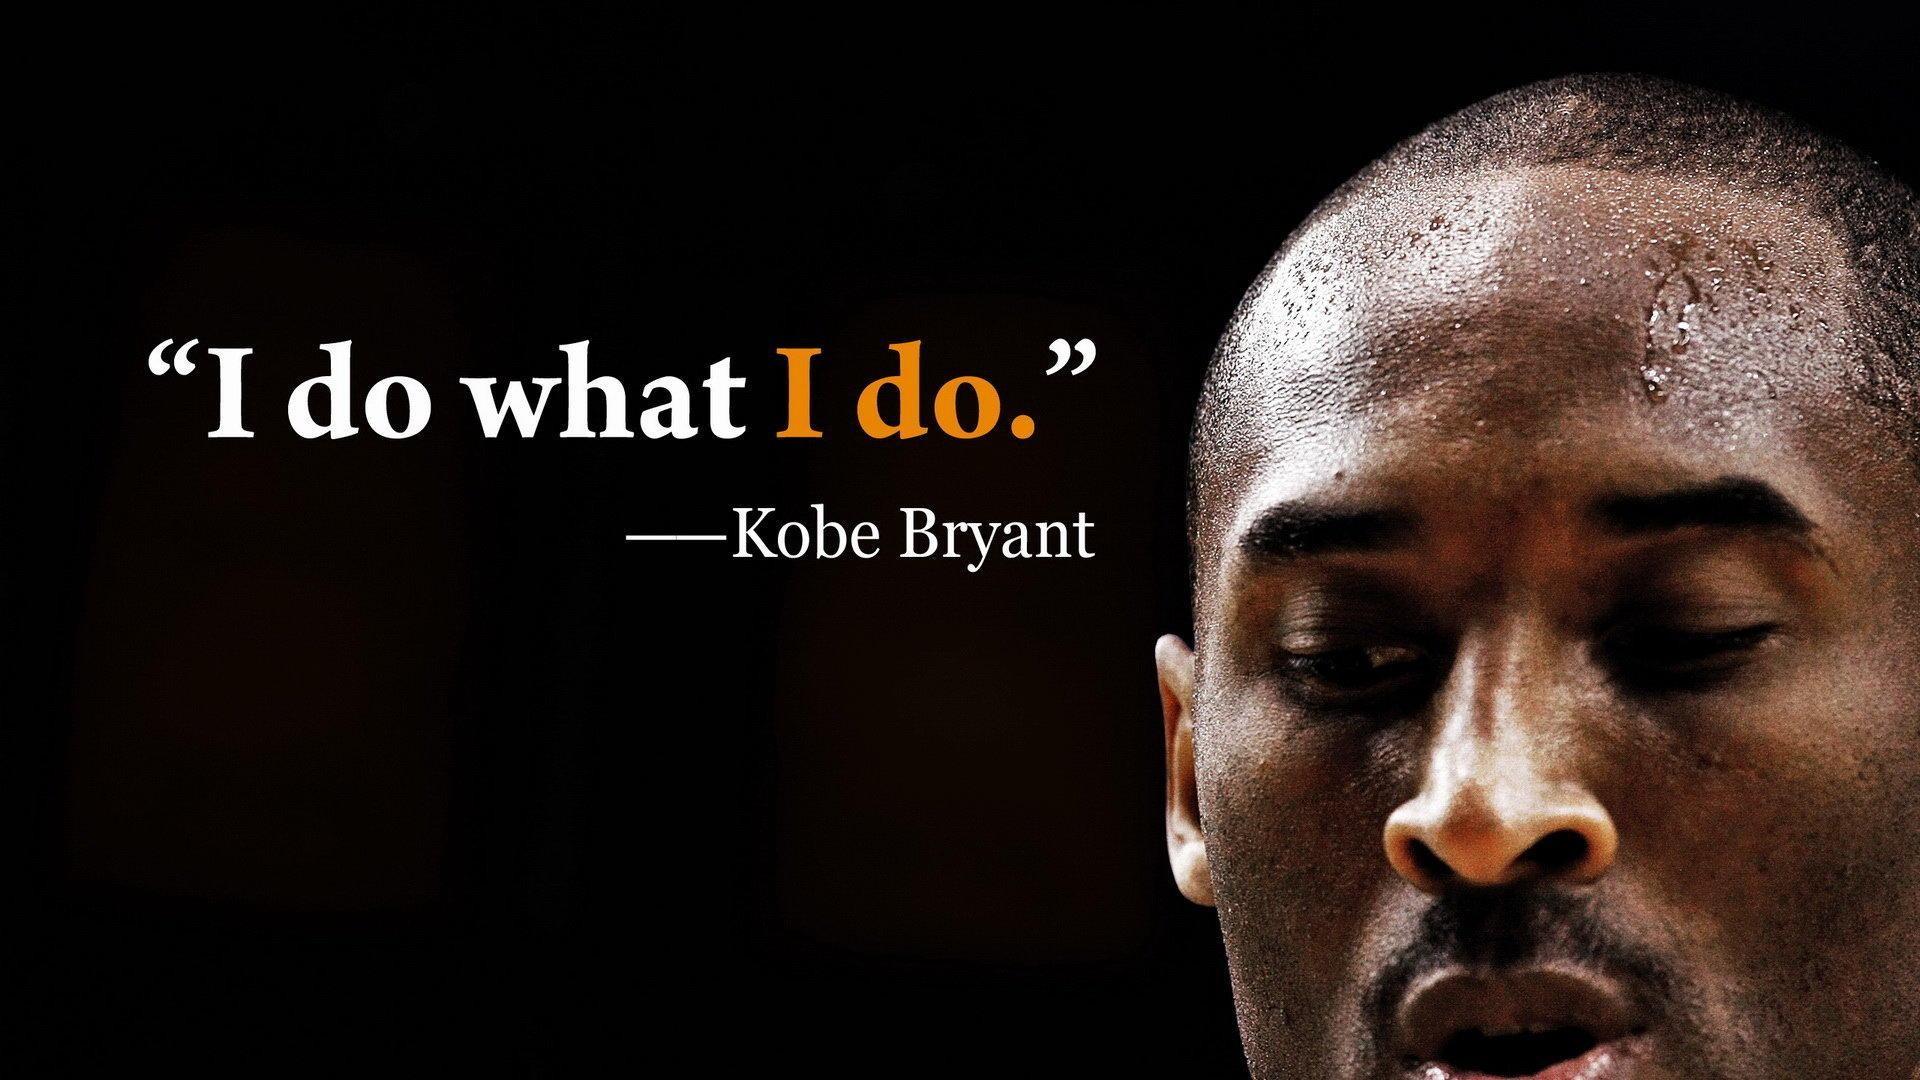 Kobe Bryant 1080p HD Wallpaper